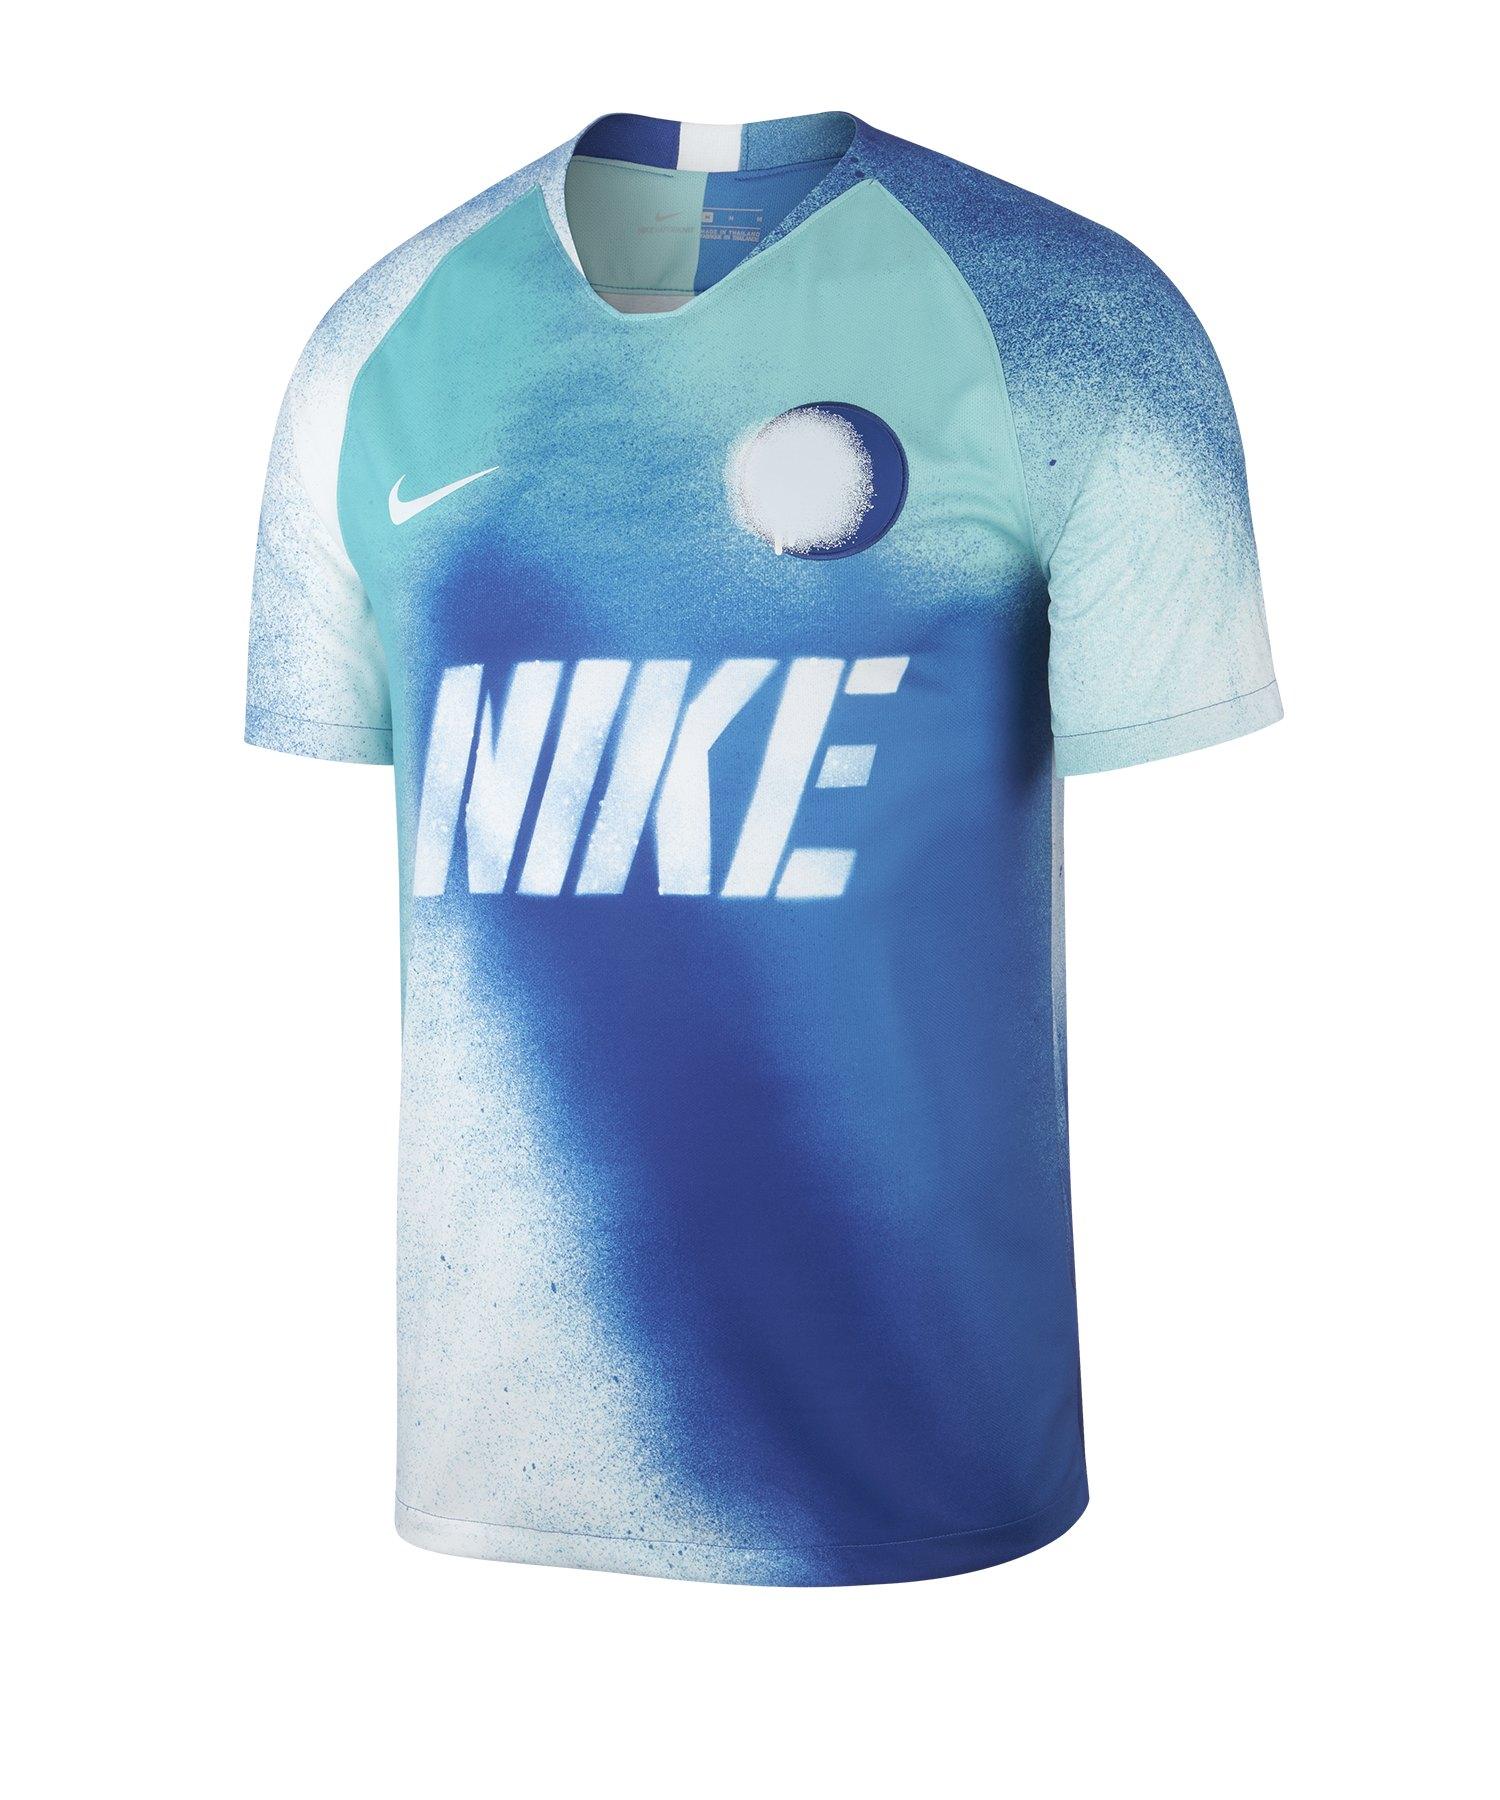 Nike Dry Strike Spray Trikot kurzarm Blau F480 - Blau